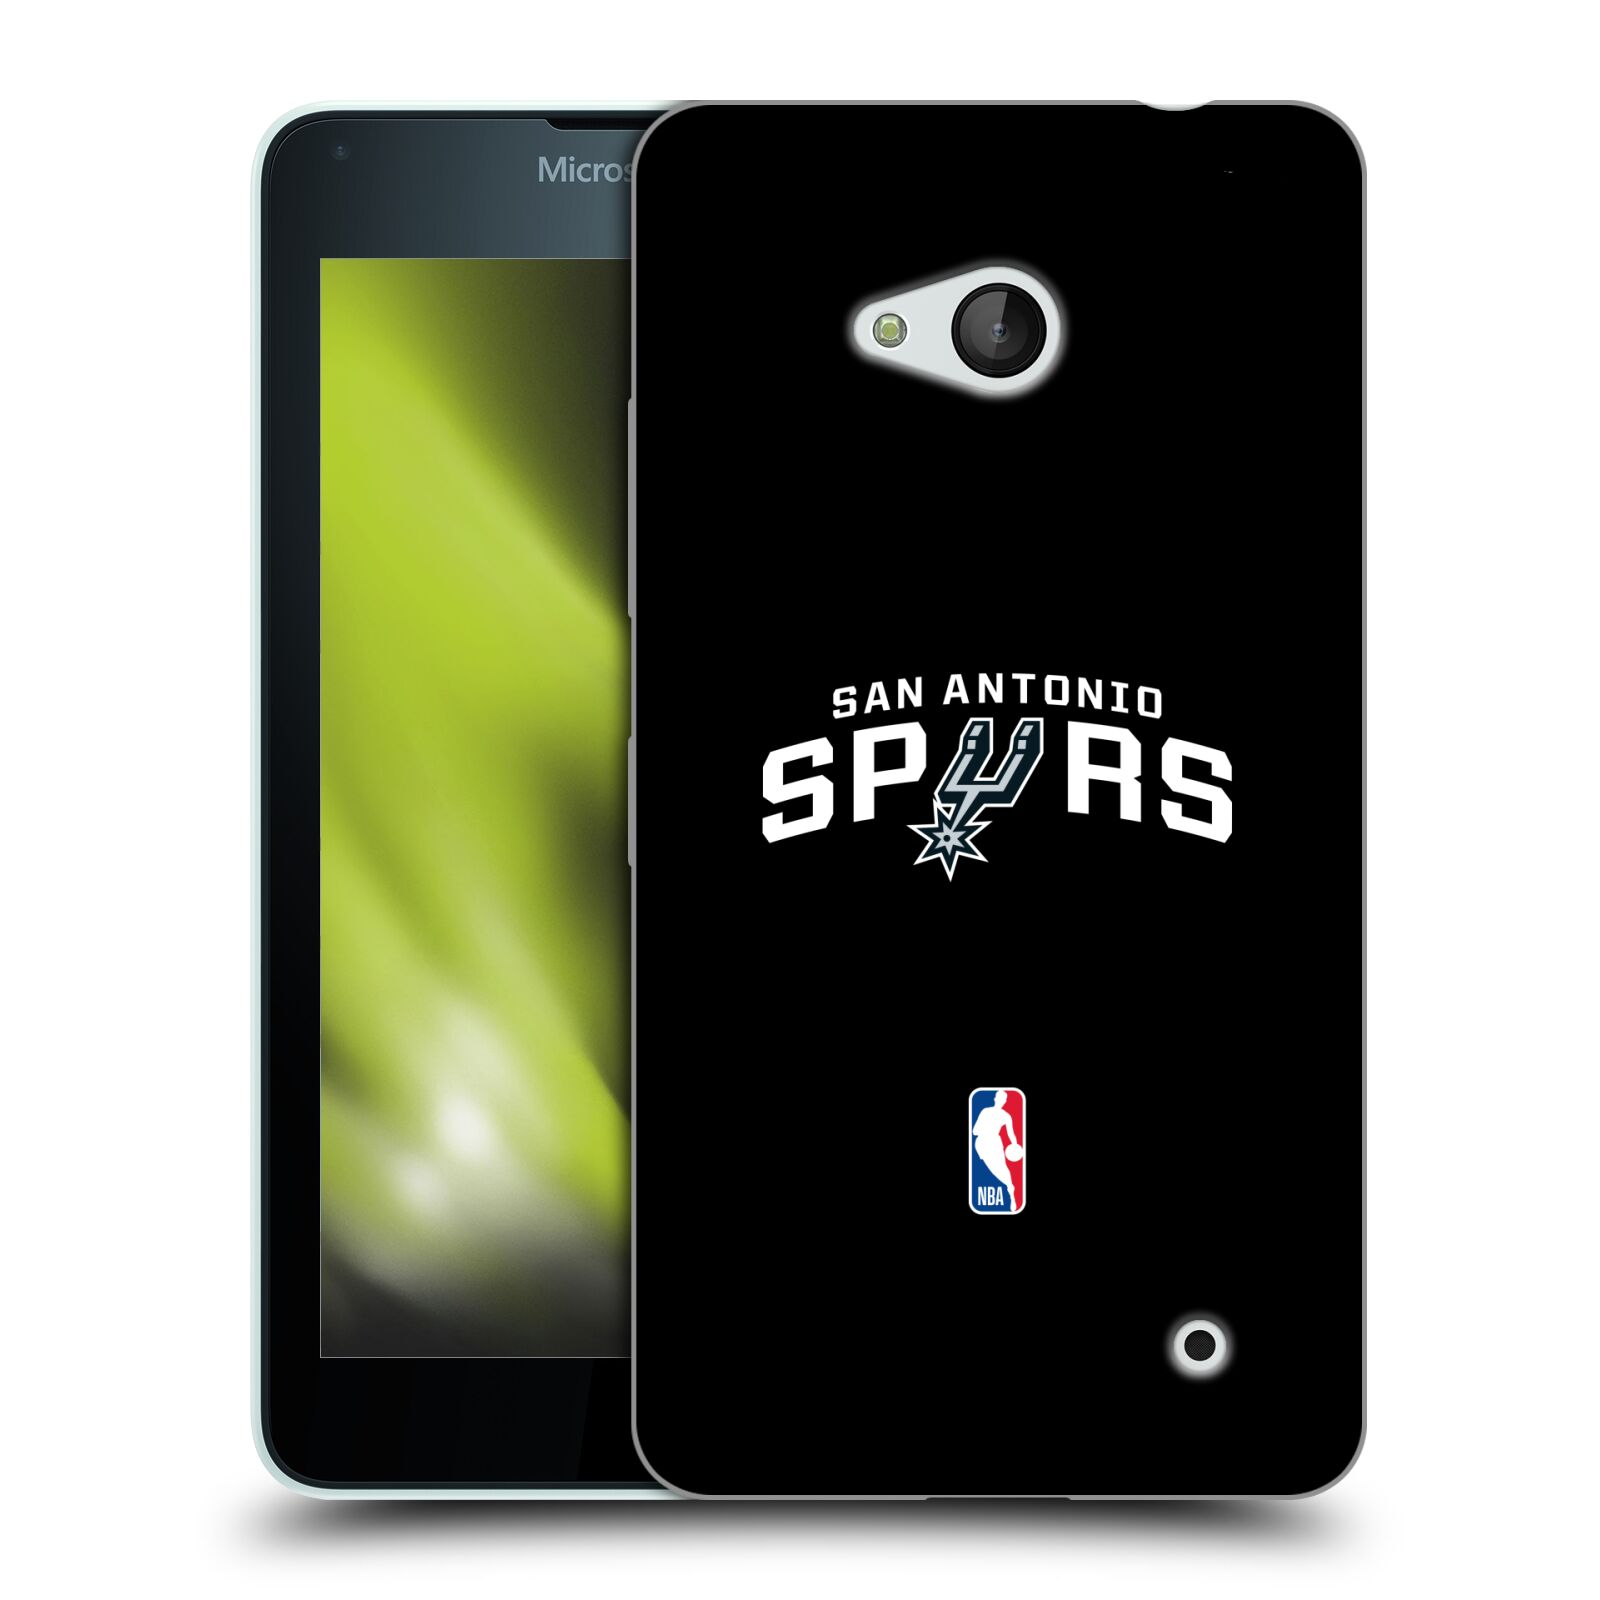 UFFICIALE-NBA-SAN-ANTONIO-SPURS-COVER-MORBIDA-IN-GEL-PER-NOKIA-TELEFONI-1